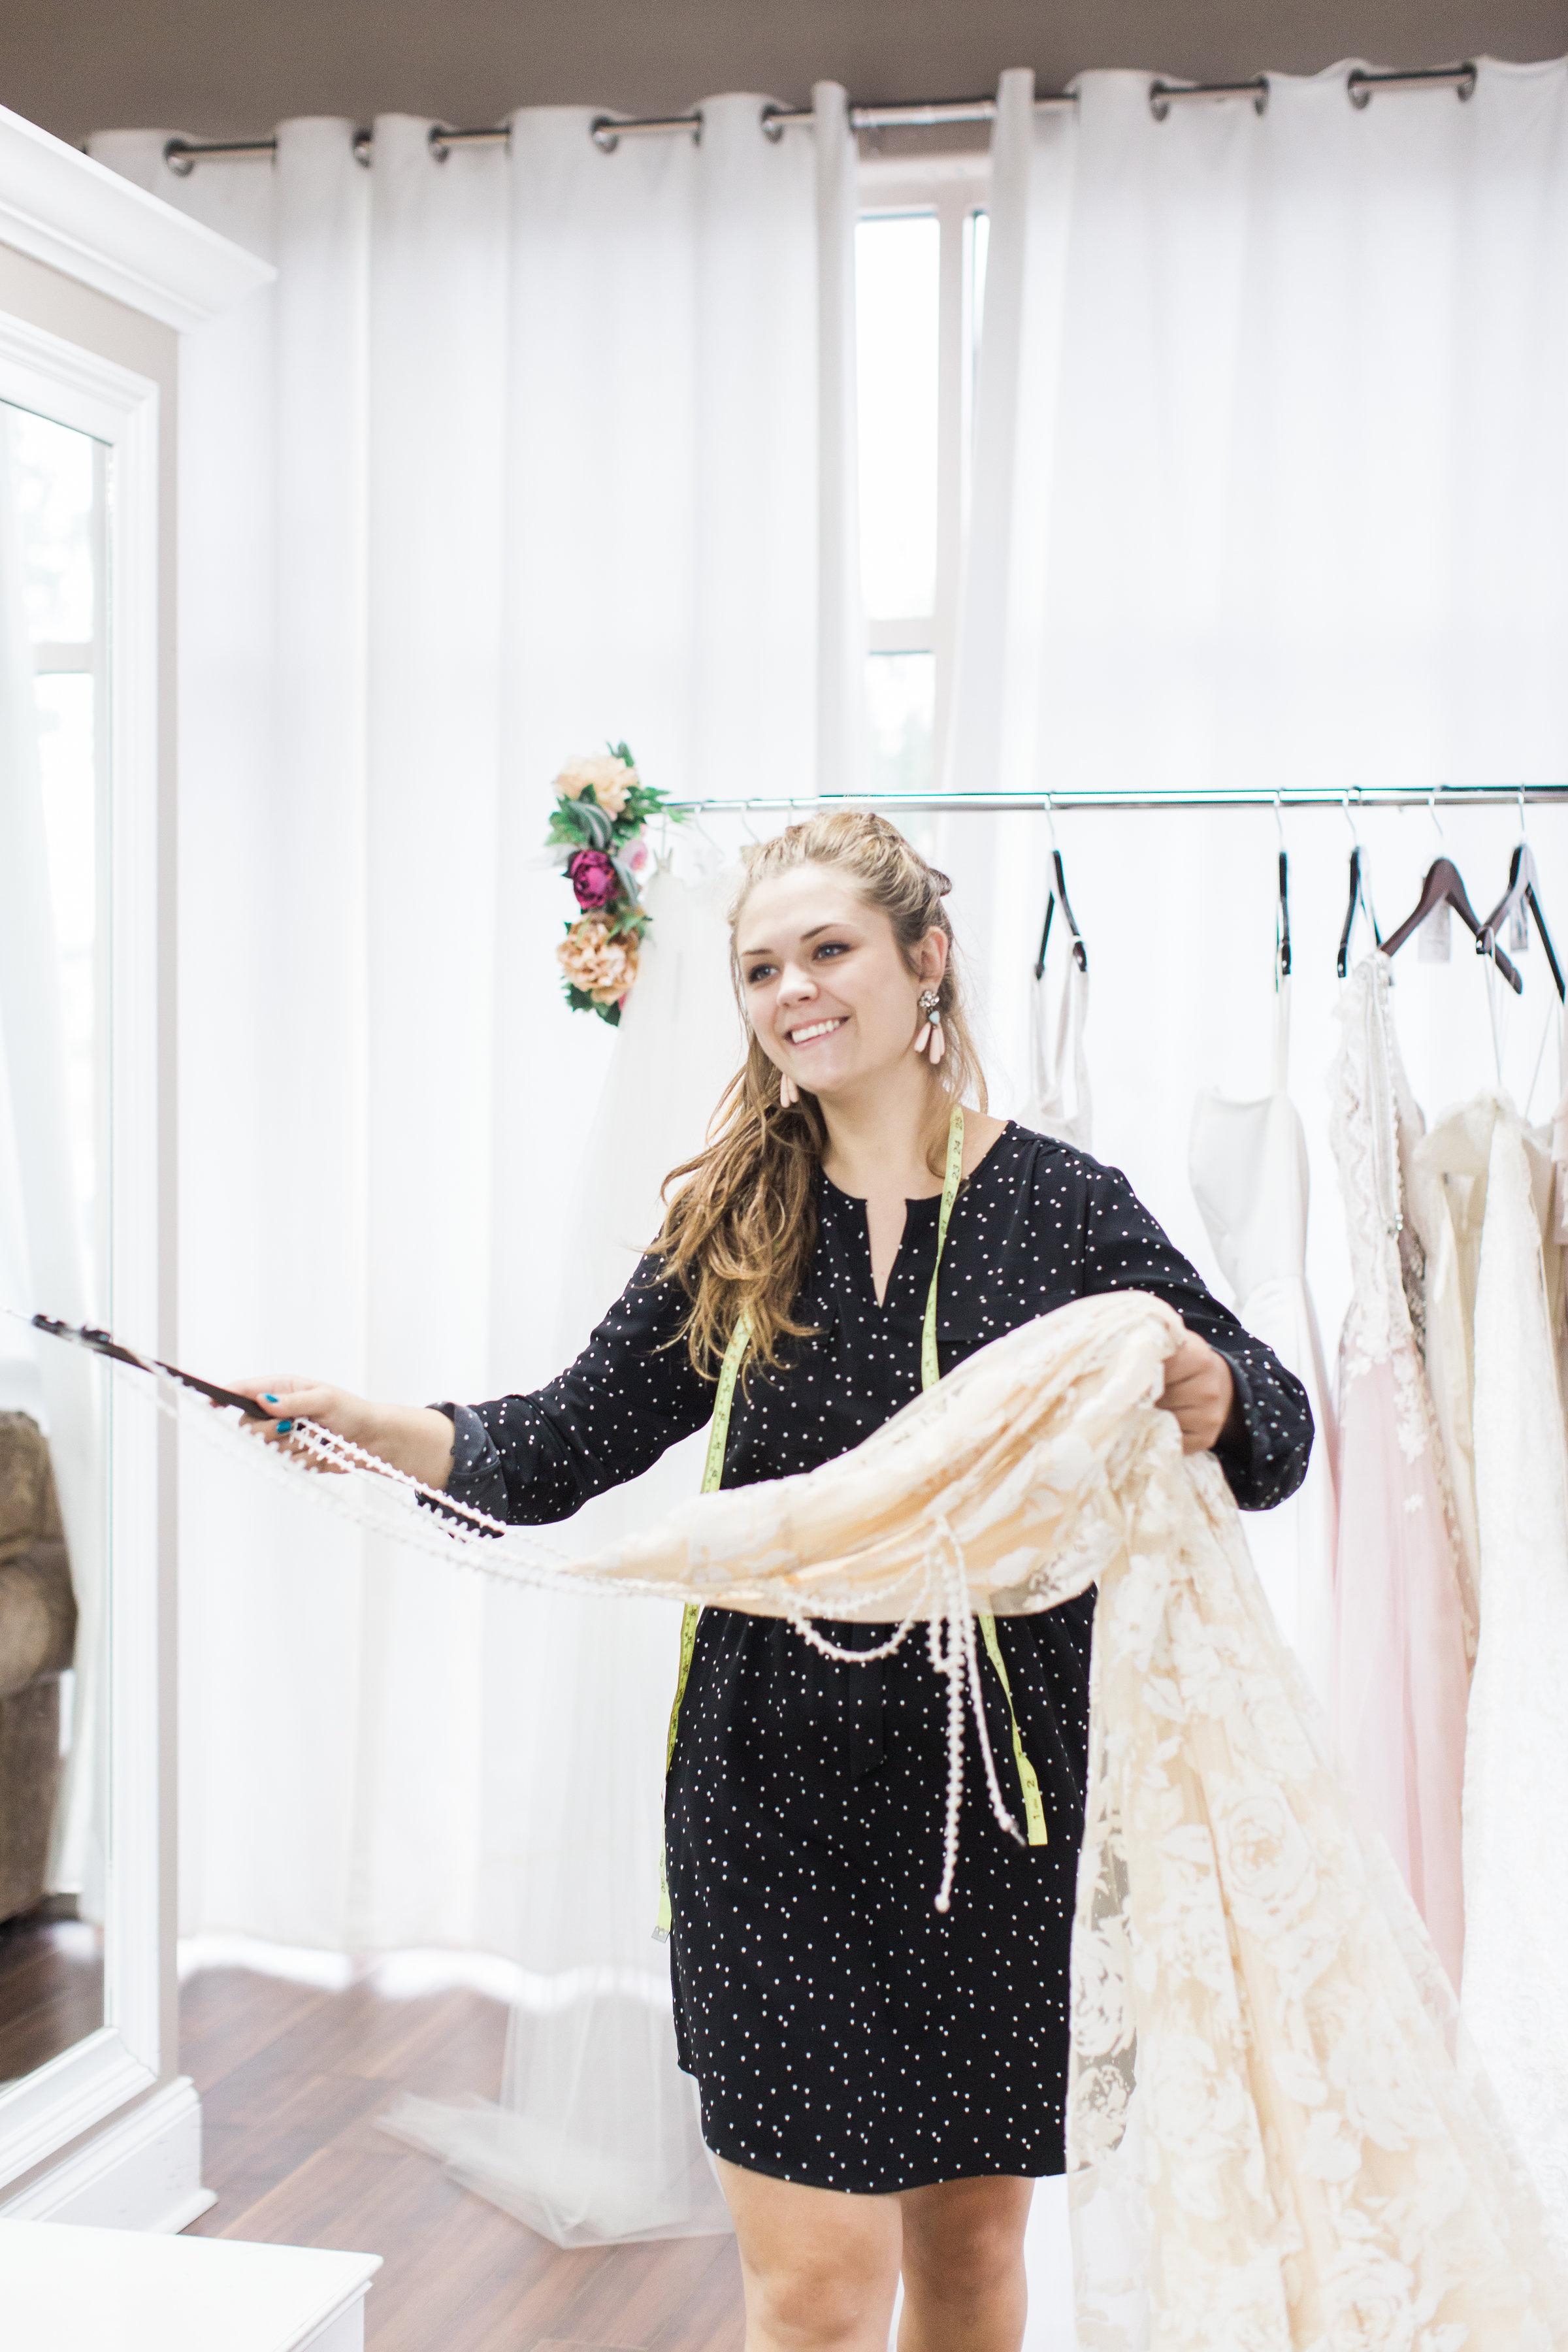 savannah-bridal-boutique-ivory-and-beau-savannah-bride-savannah-bridal-shop-wedding-dress-savannah-weddings-wedding-dress-savannah-aptbphotography-aptbphoto-veils-tiaras-bridal-jewelery9.jpg